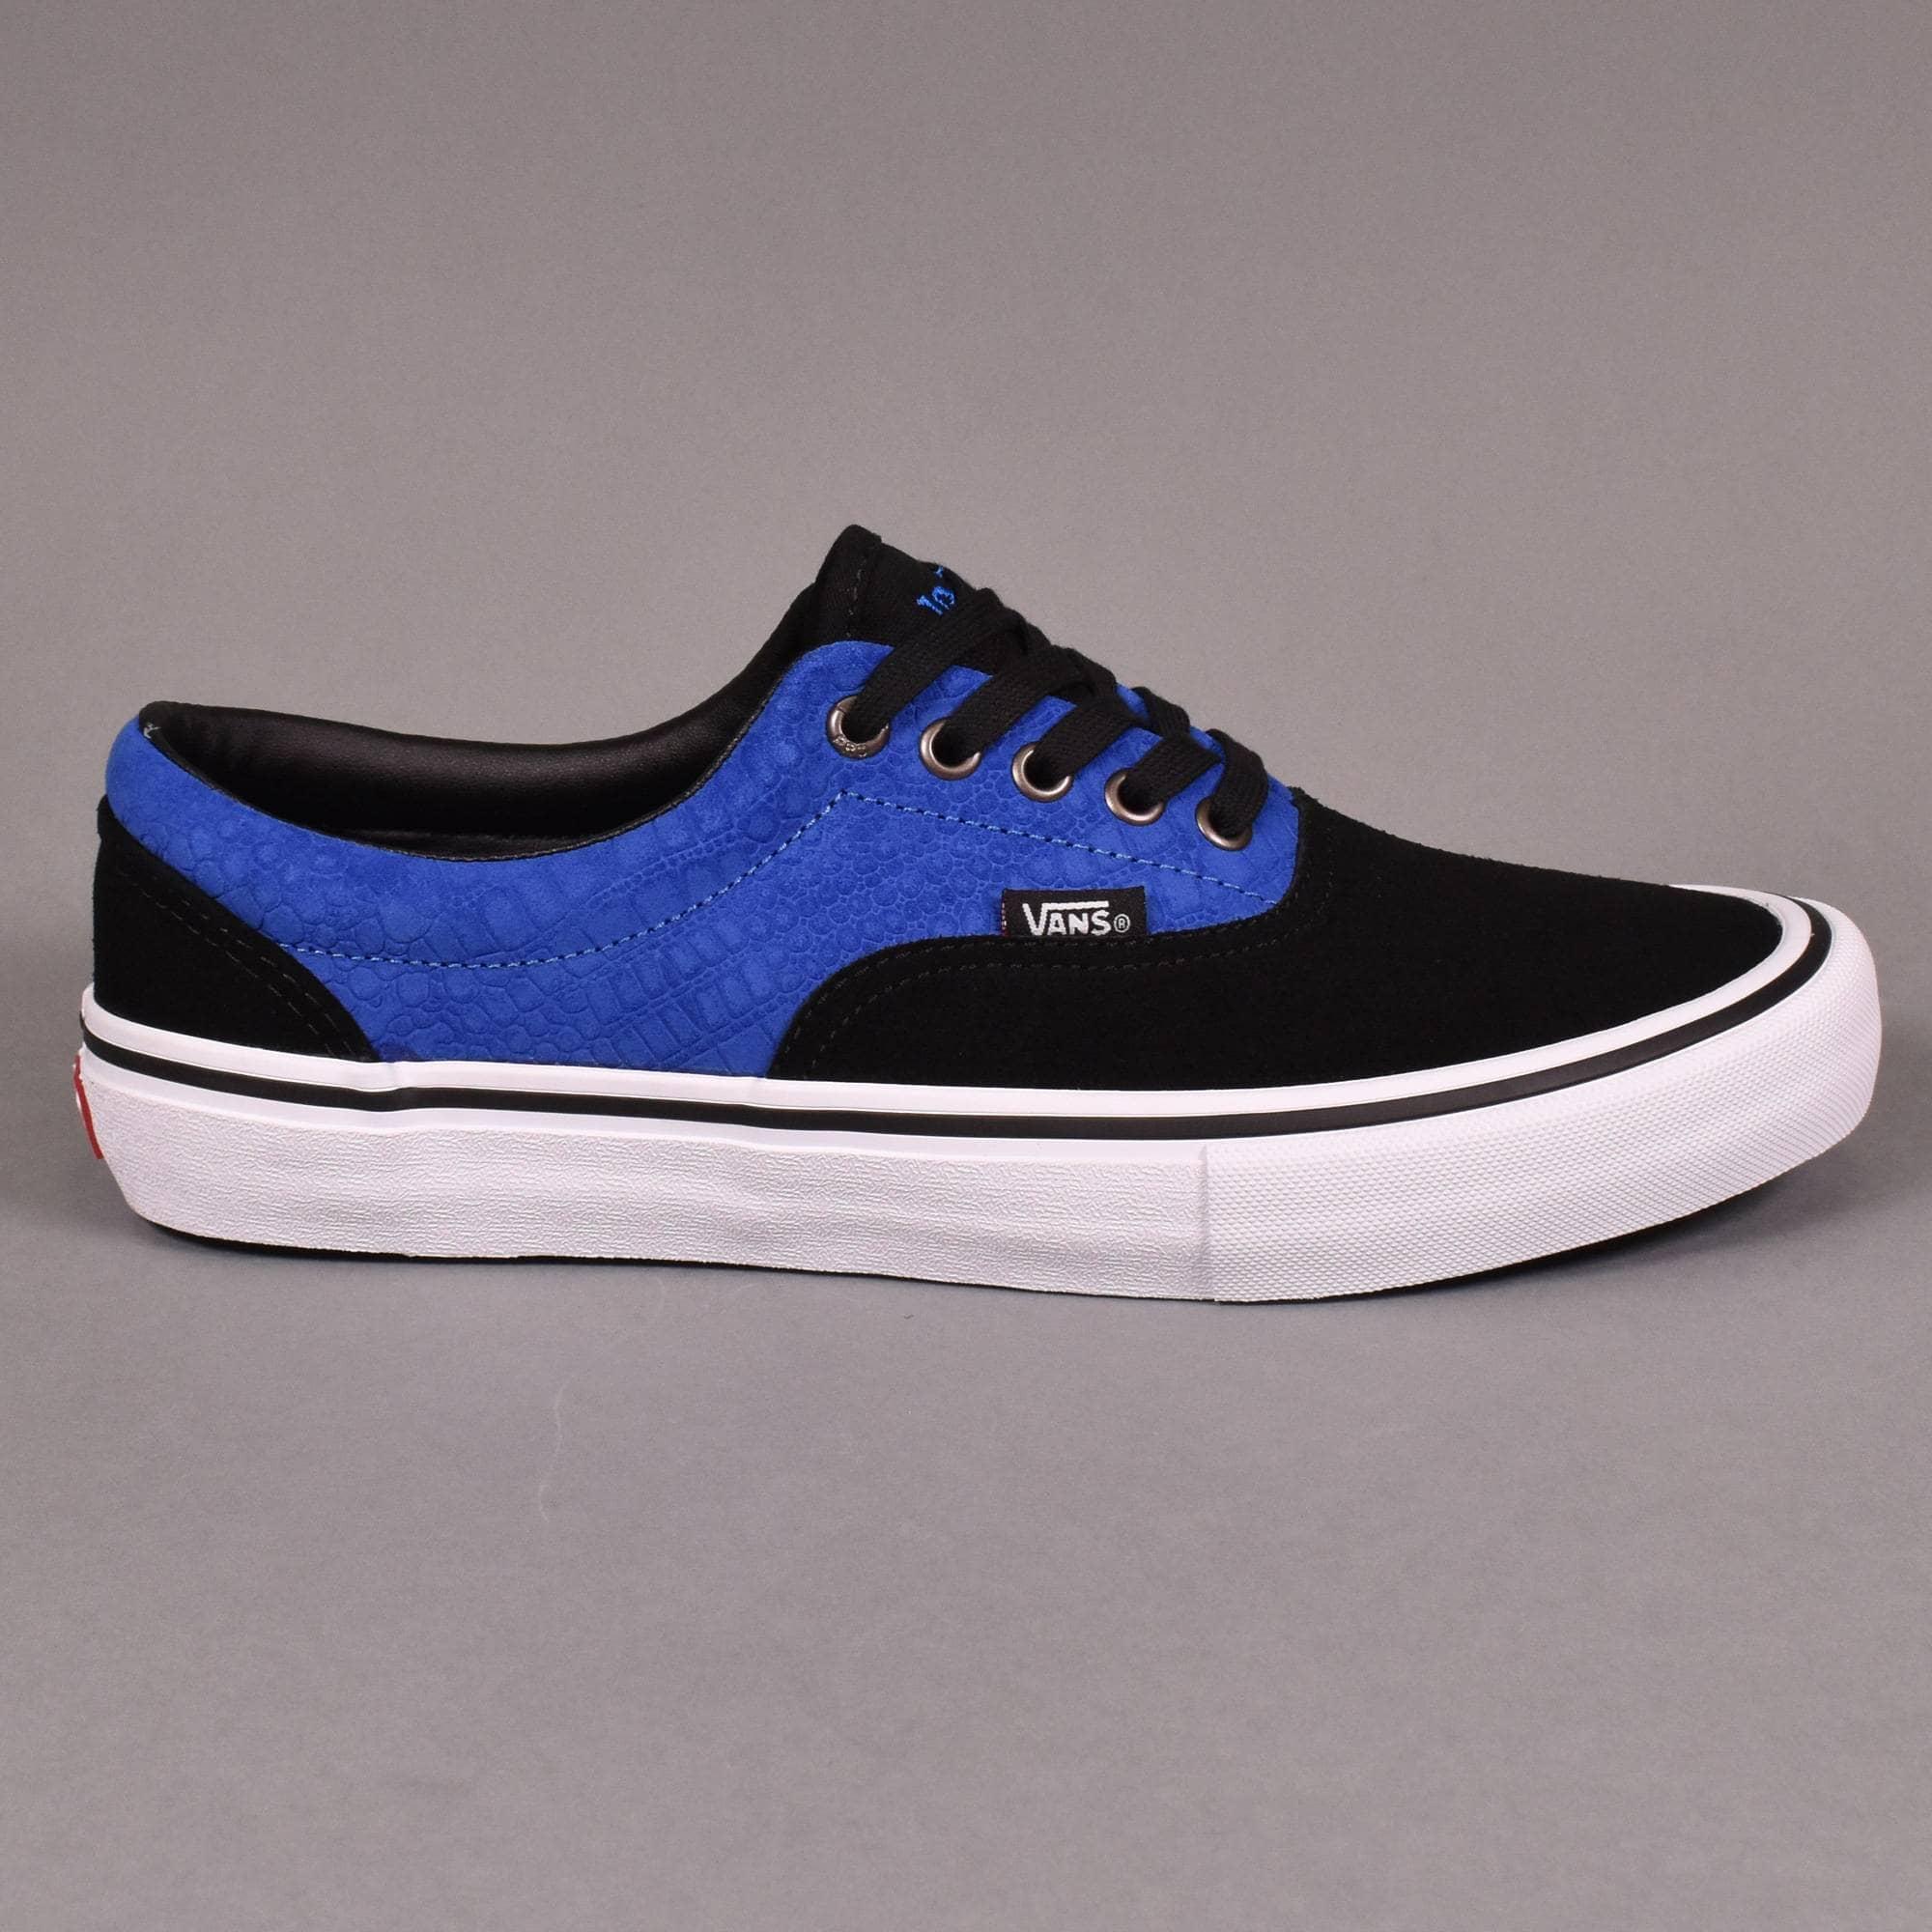 Vans Era Pro Skate Shoes - (Rowan